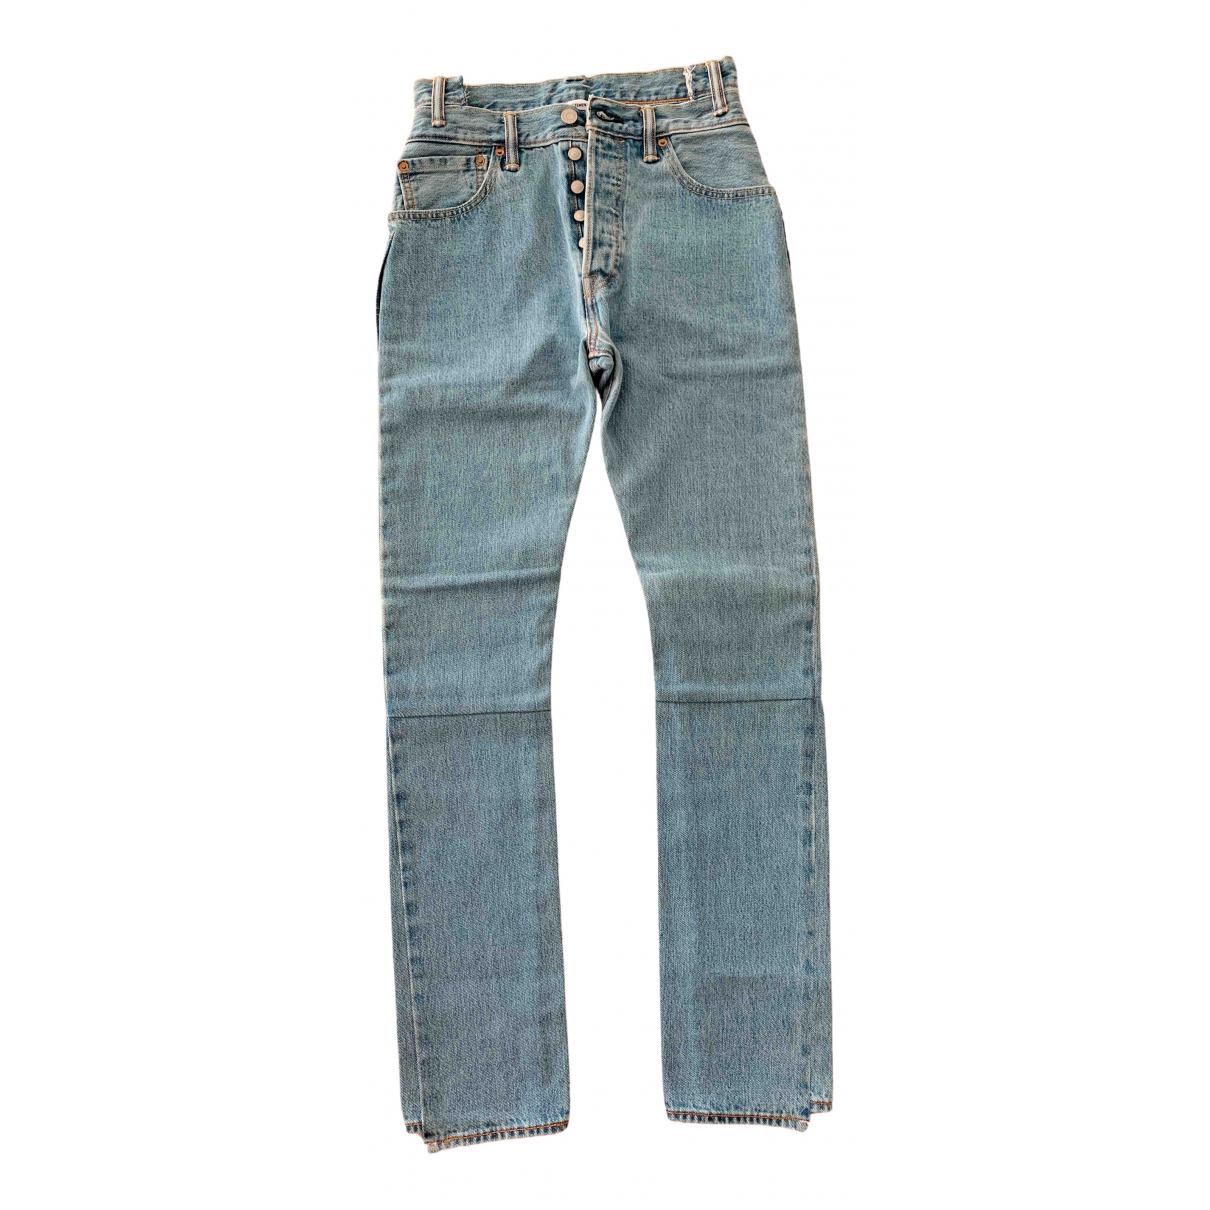 Vetements N Blue Denim - Jeans Jeans for Women S International